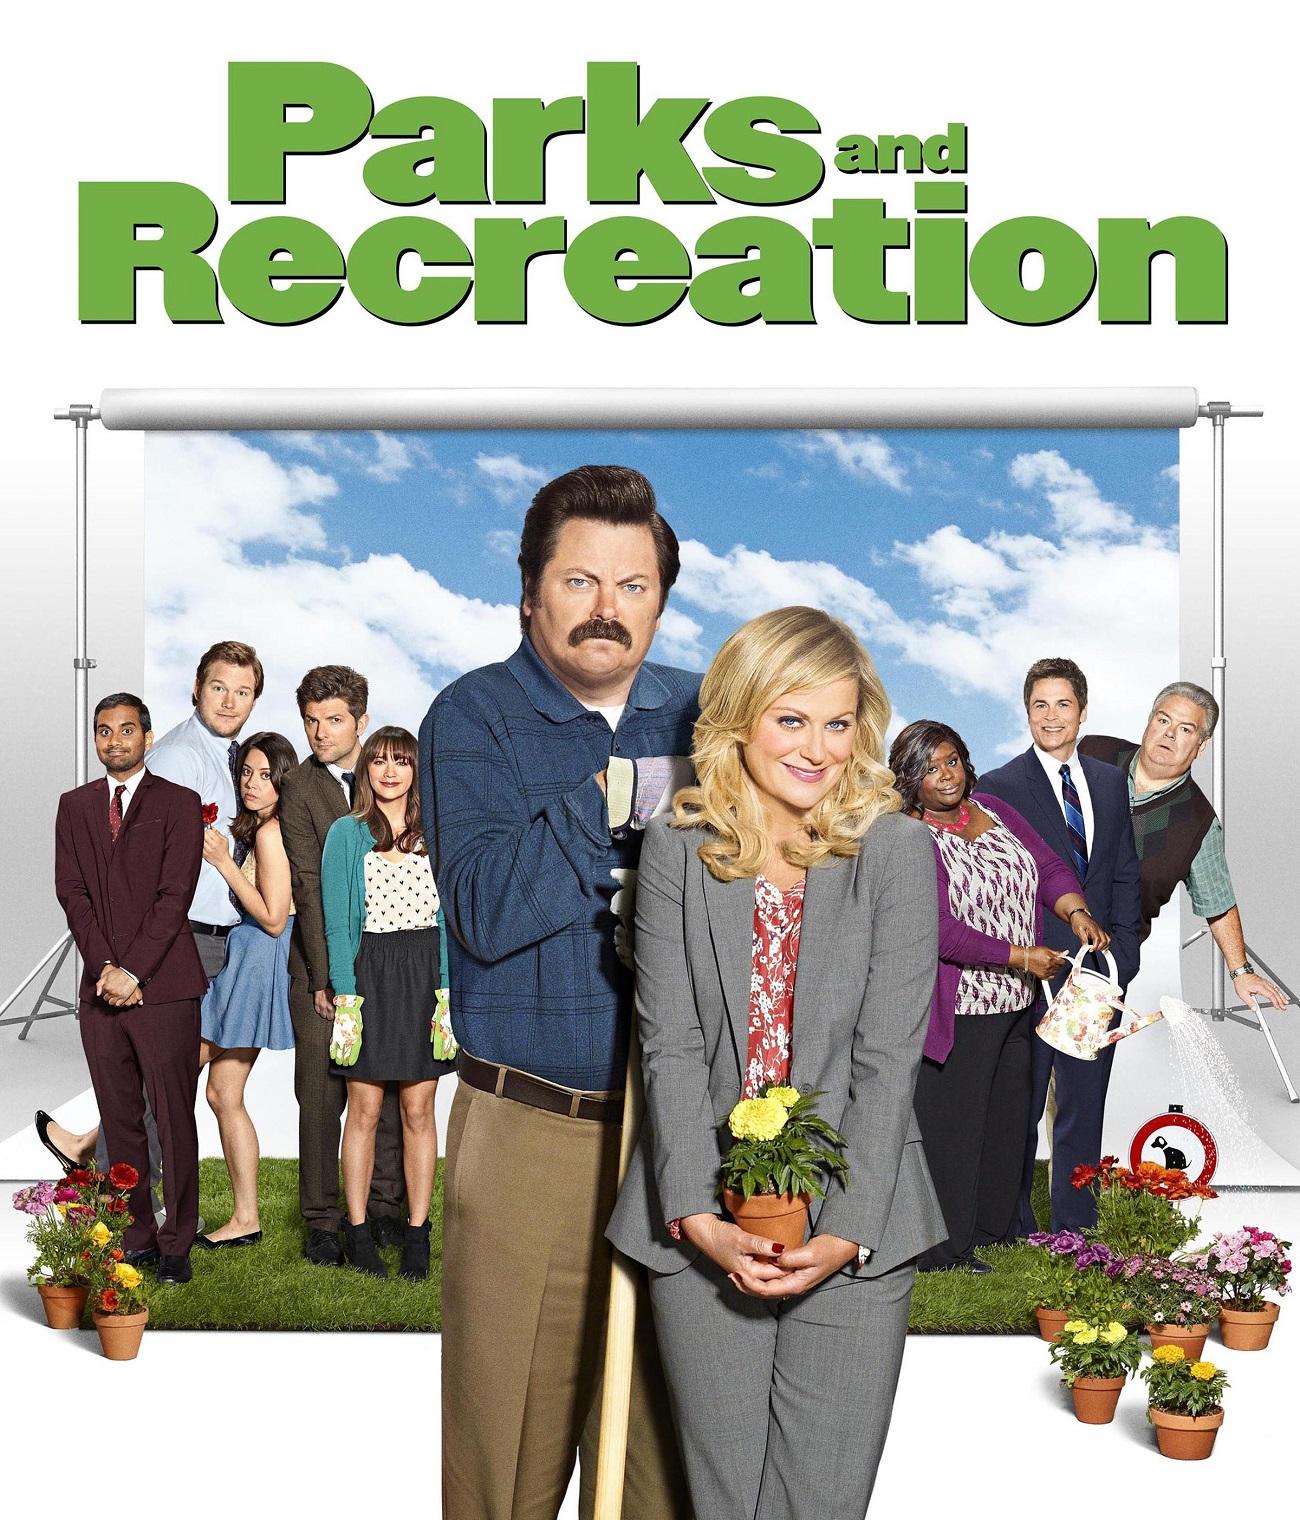 Subaru to Sponsor 'Parks and Recreation' Reunion Special - The News Wheel